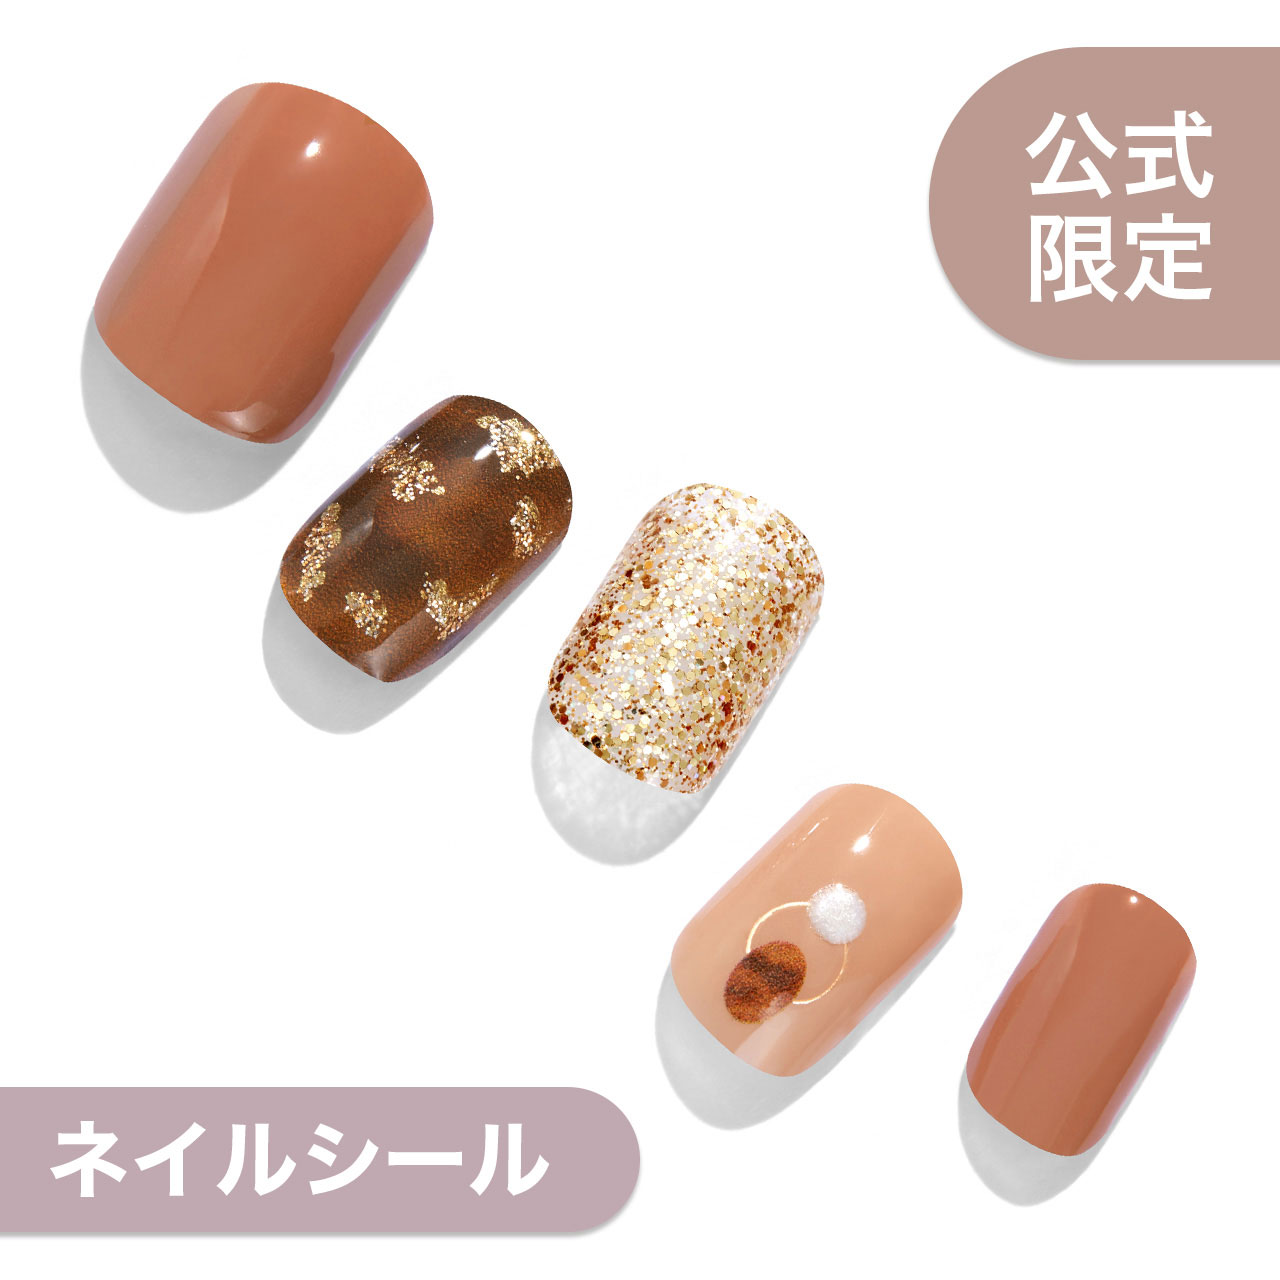 【Toffeenut Latte】ダッシングディバグロスジェルネイルシール